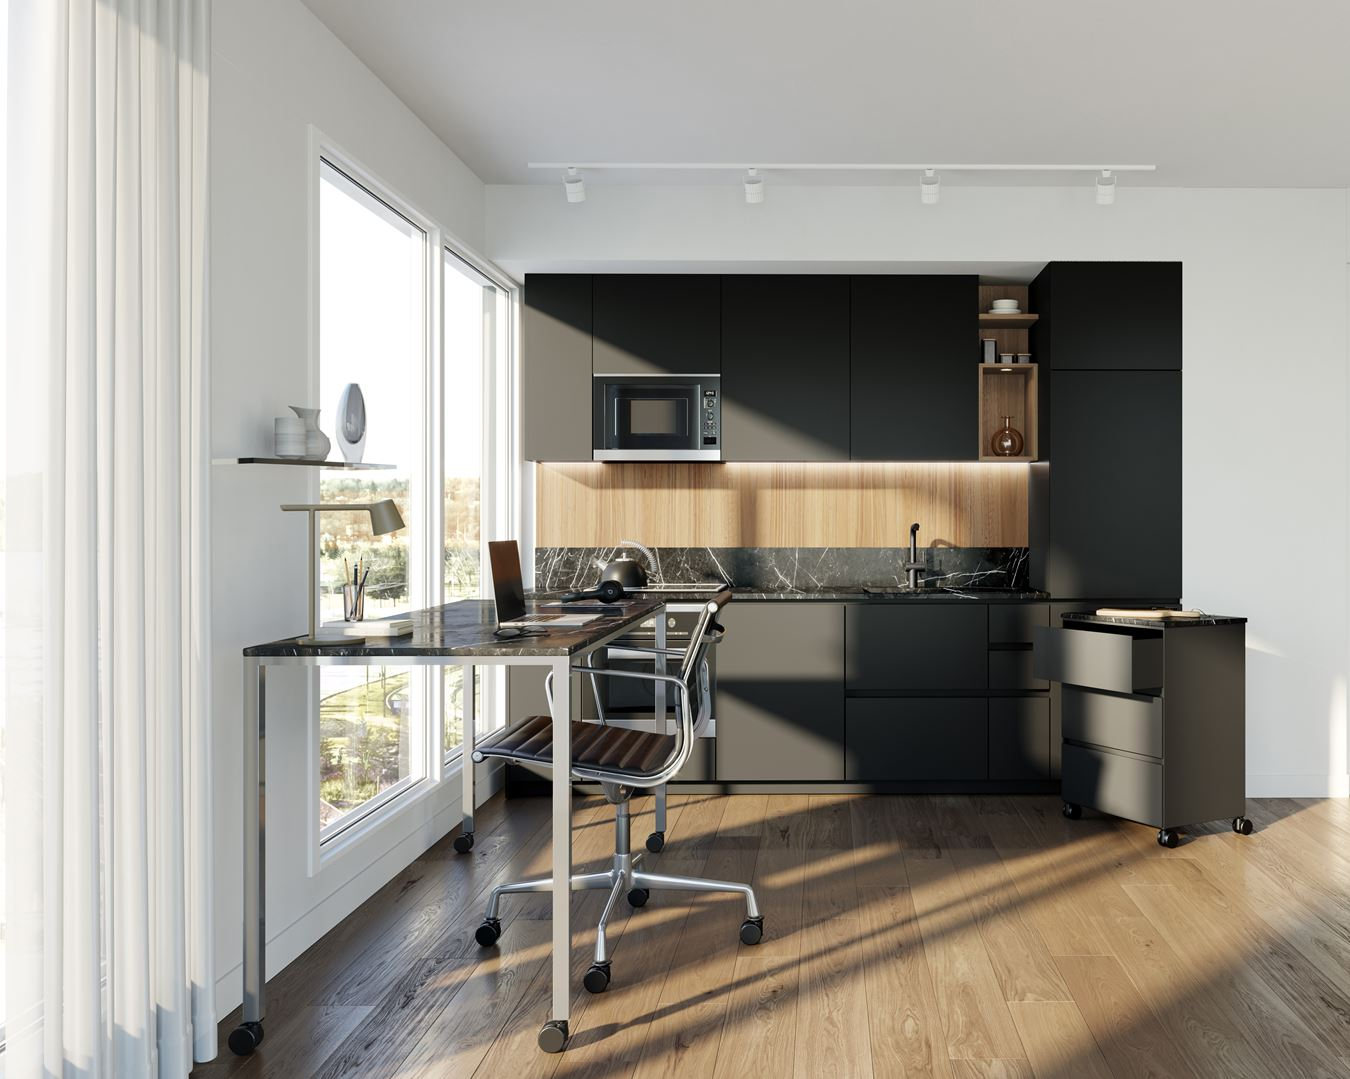 Debut_Kitchen_Desk